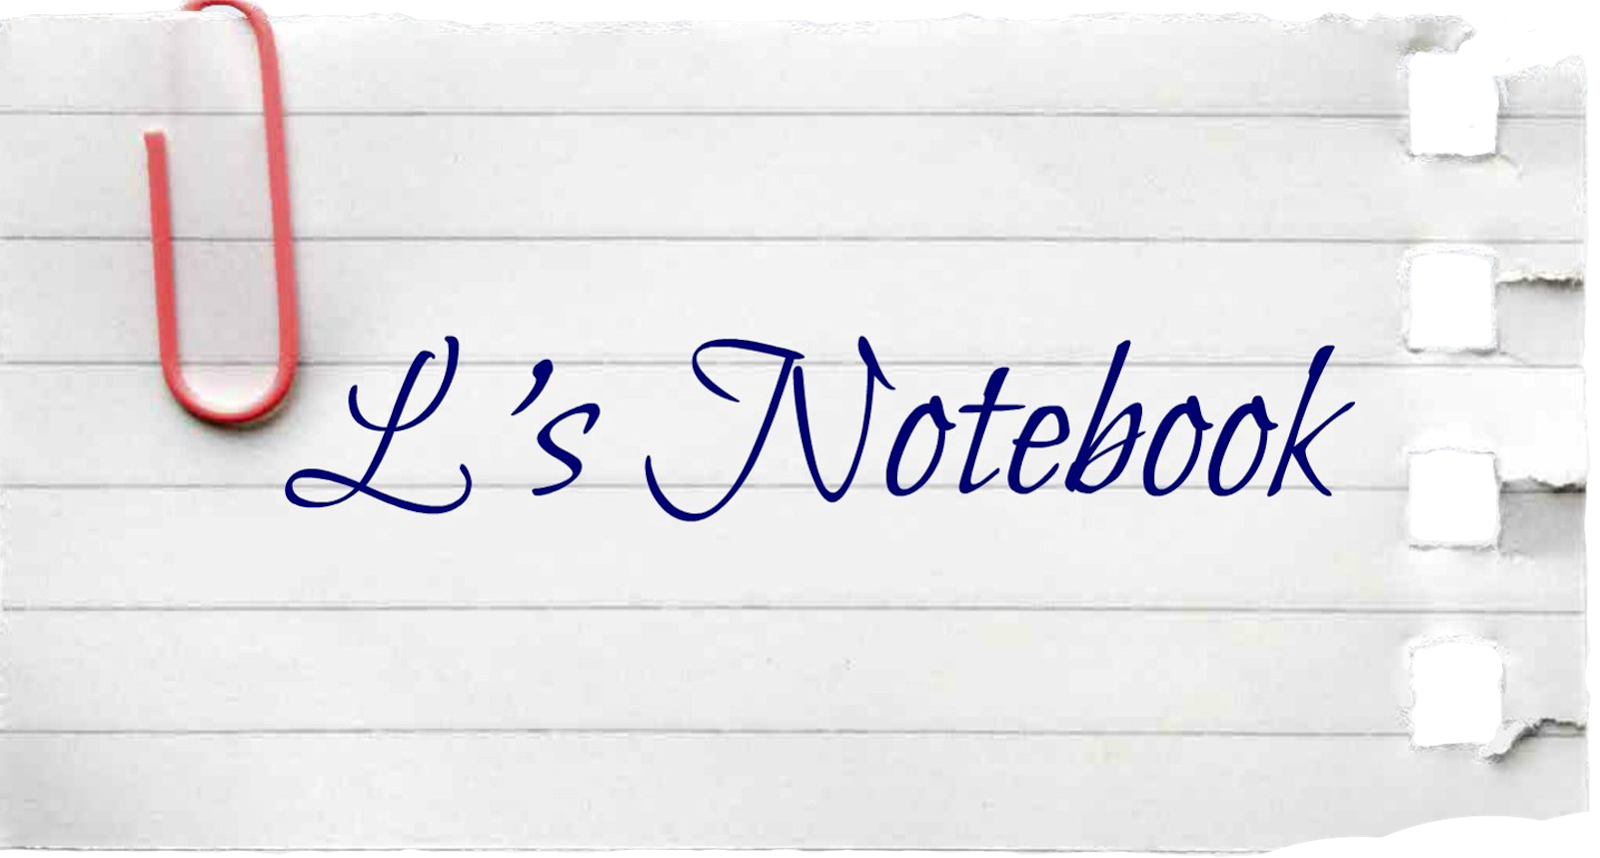 L's Notebook